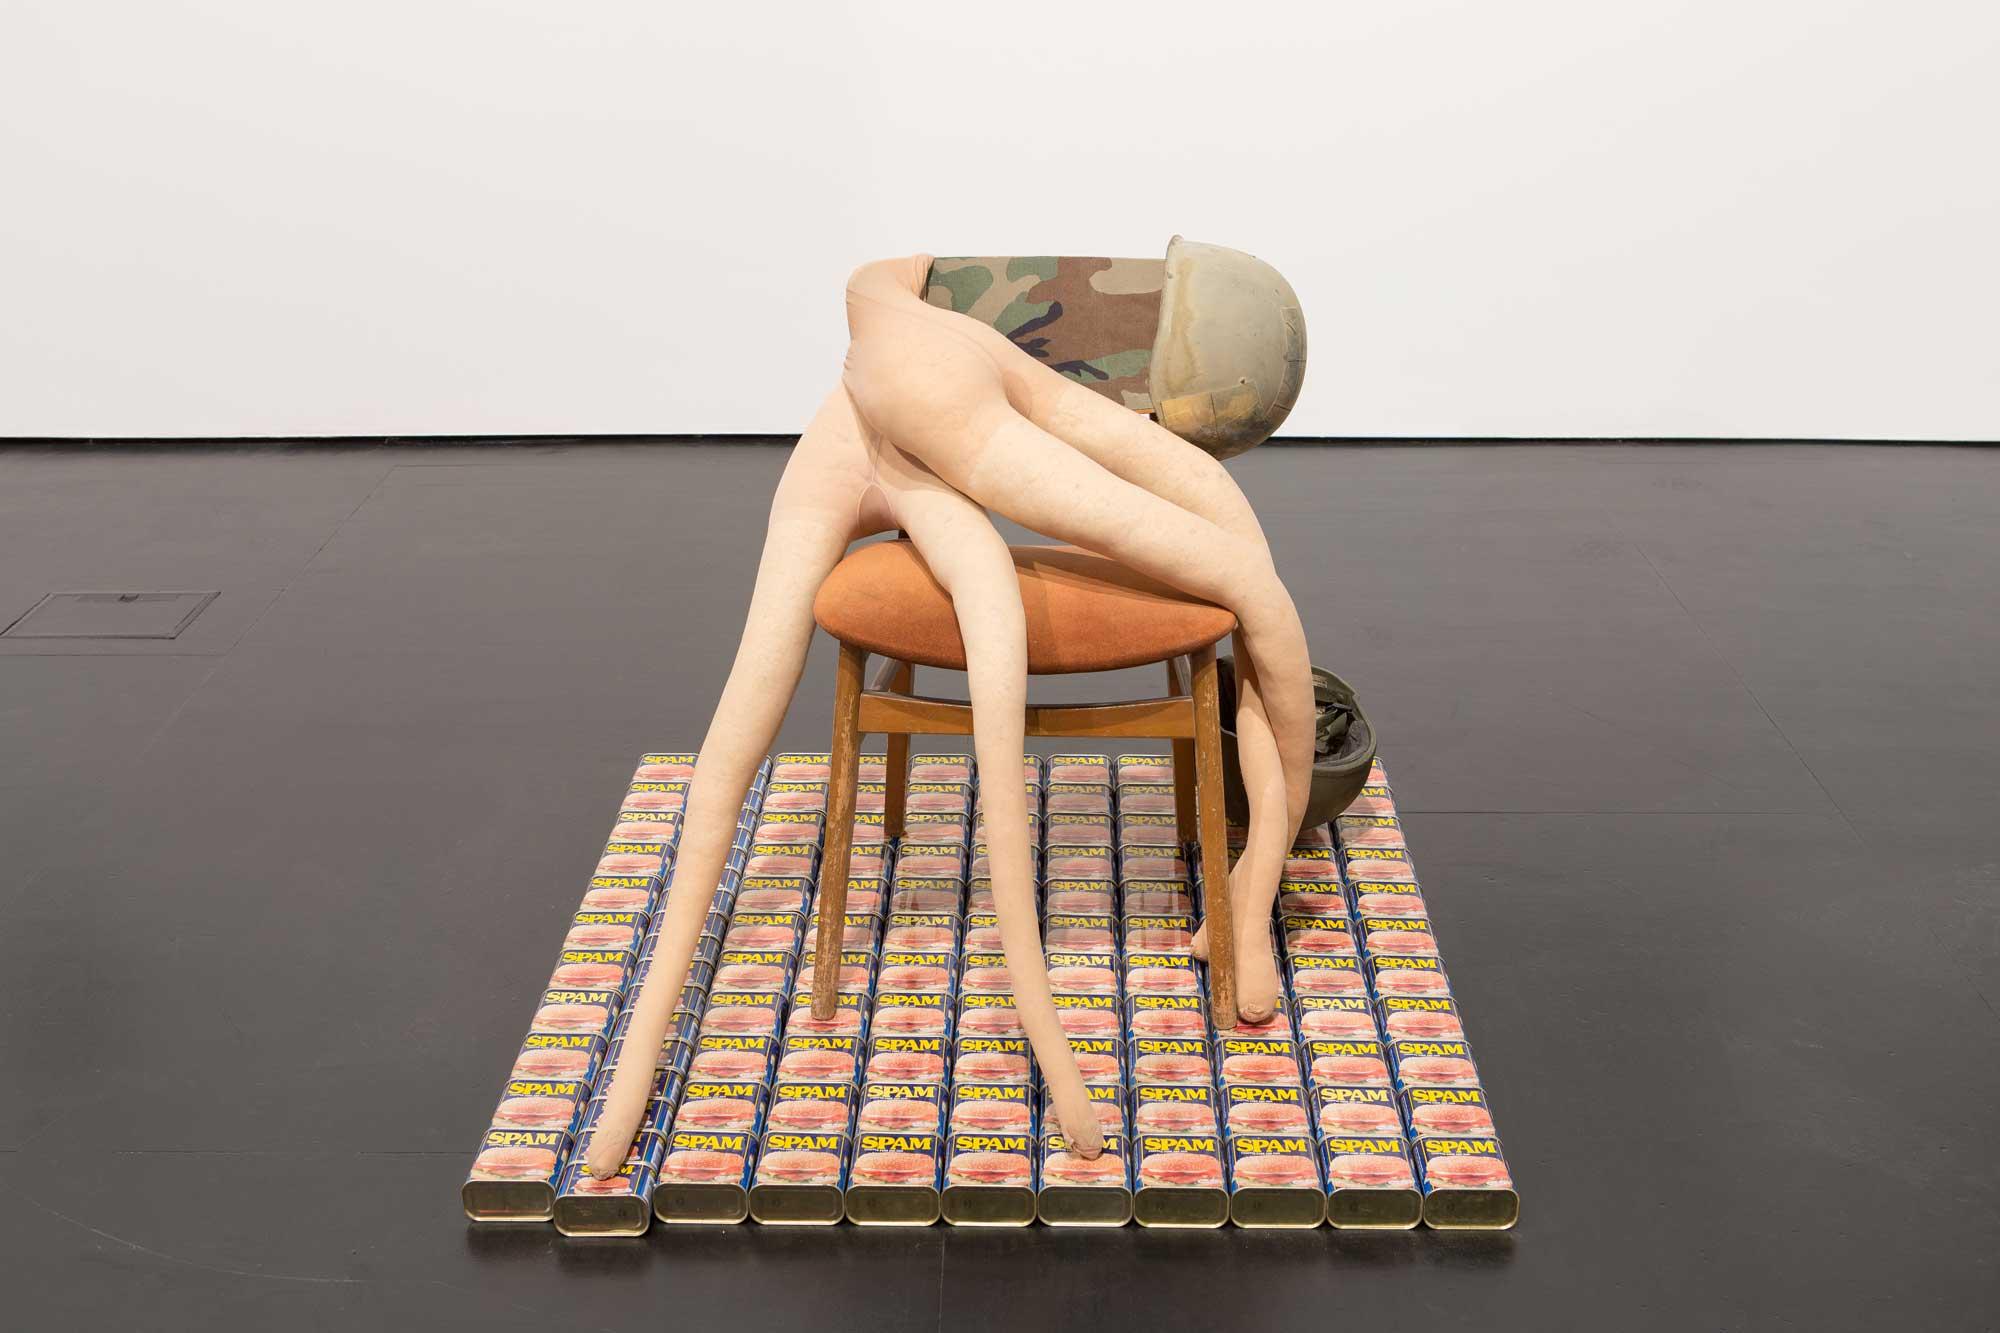 Sarah Lucas, Spamaggedon, 2014, installation view, Zabludowicz Collection: 20 Years, 2015 at Zabludowicz Collection, London. Photo: Tim Bowditch